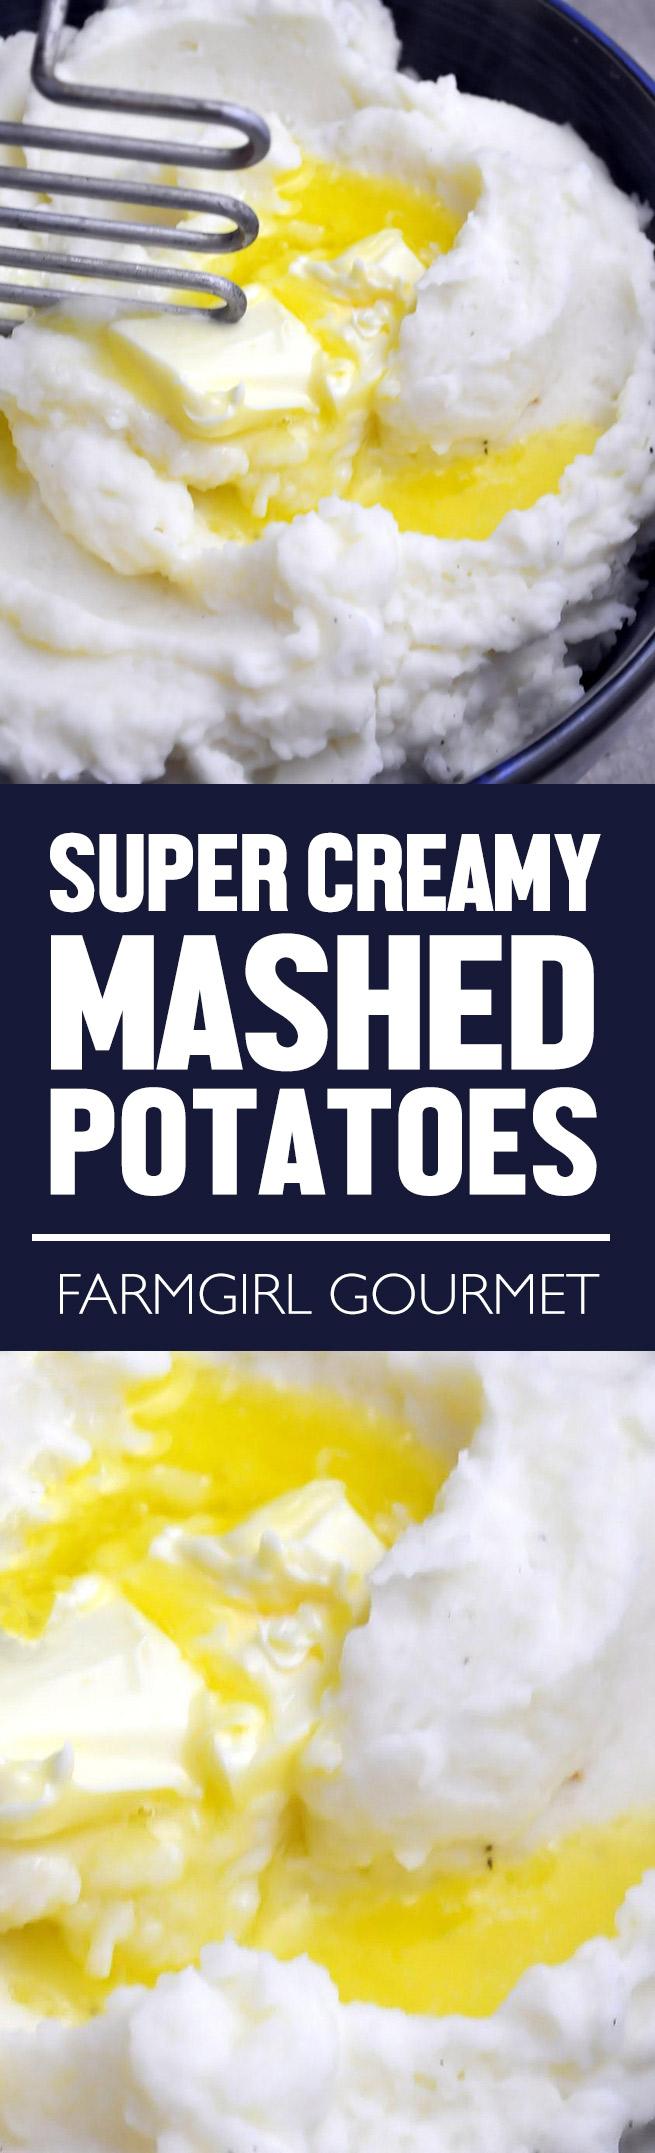 Super Creamy Mashed Potatoes recipe | farmgirlgourmet.com